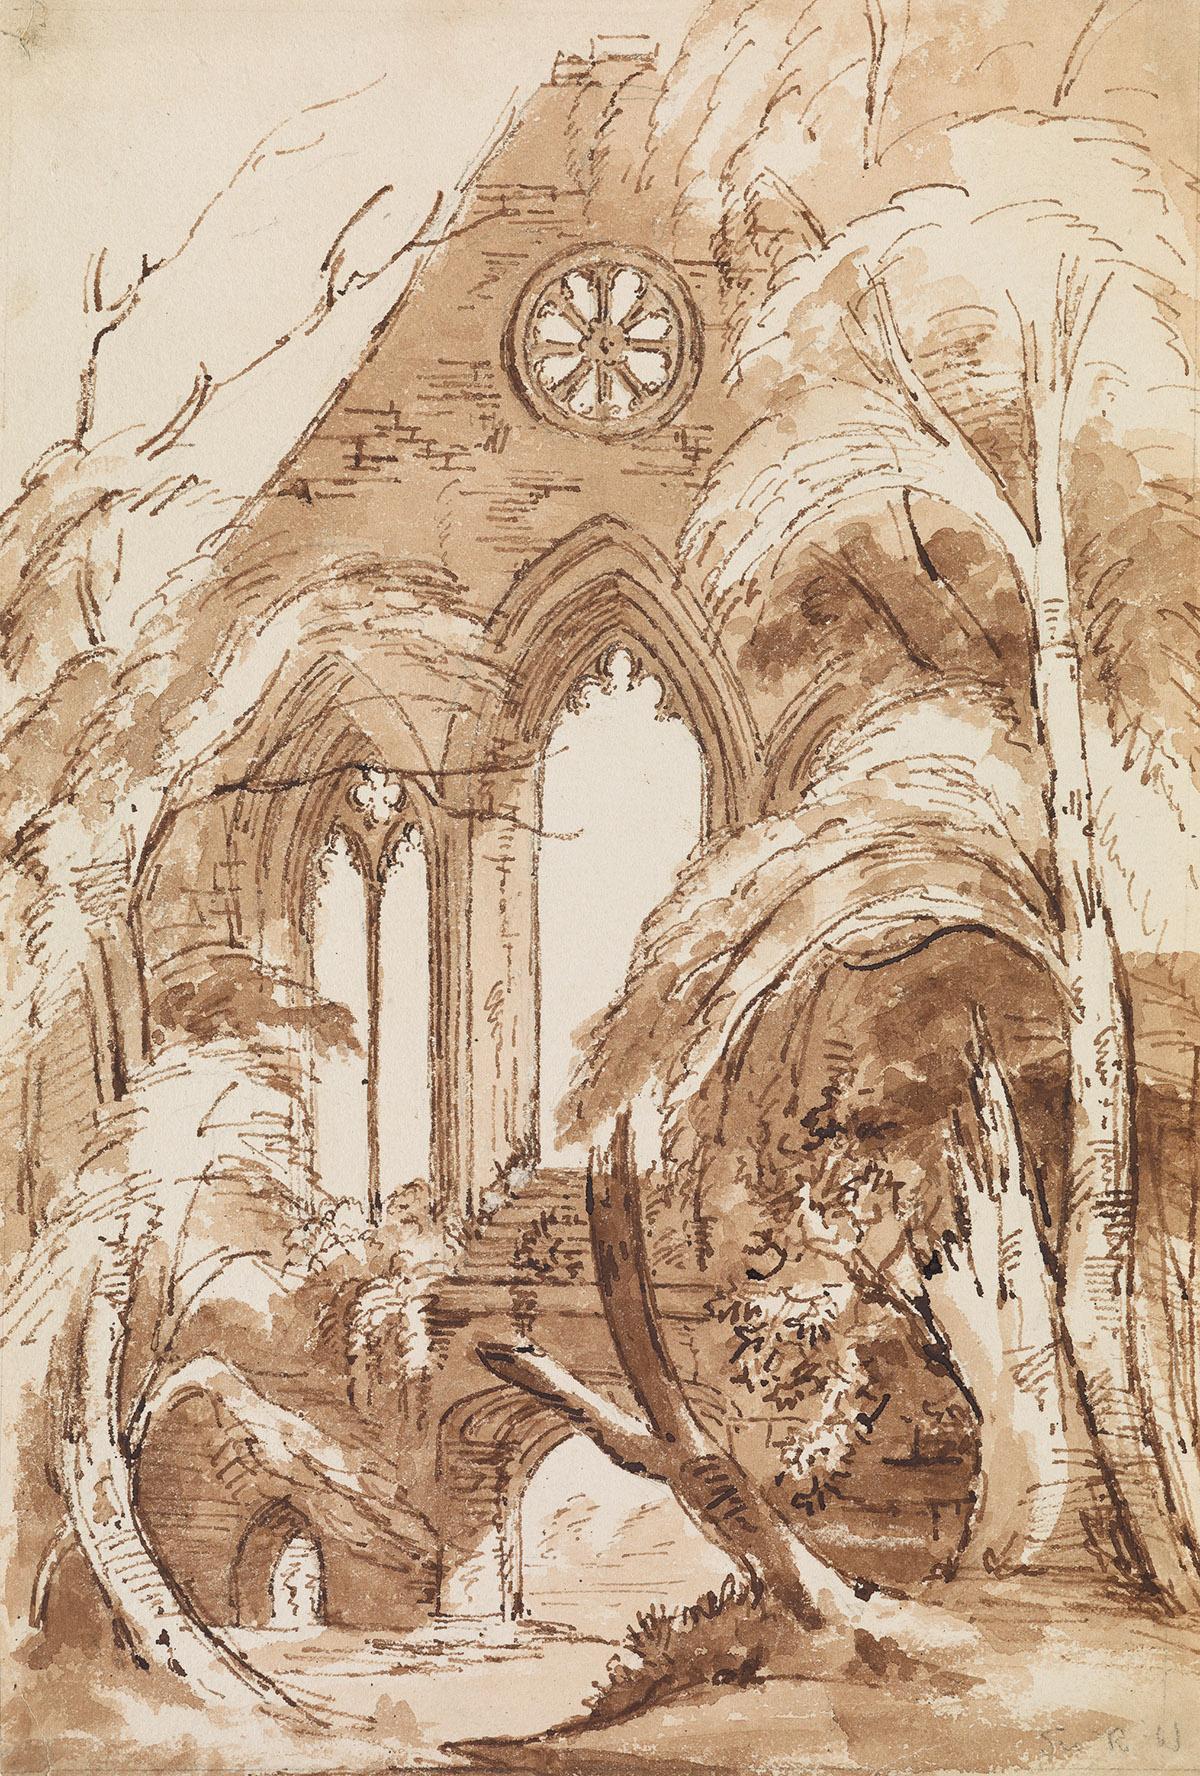 RICHARD WESTMACOTT (London 1775-1856 London) Study of a Ruined Abbey.